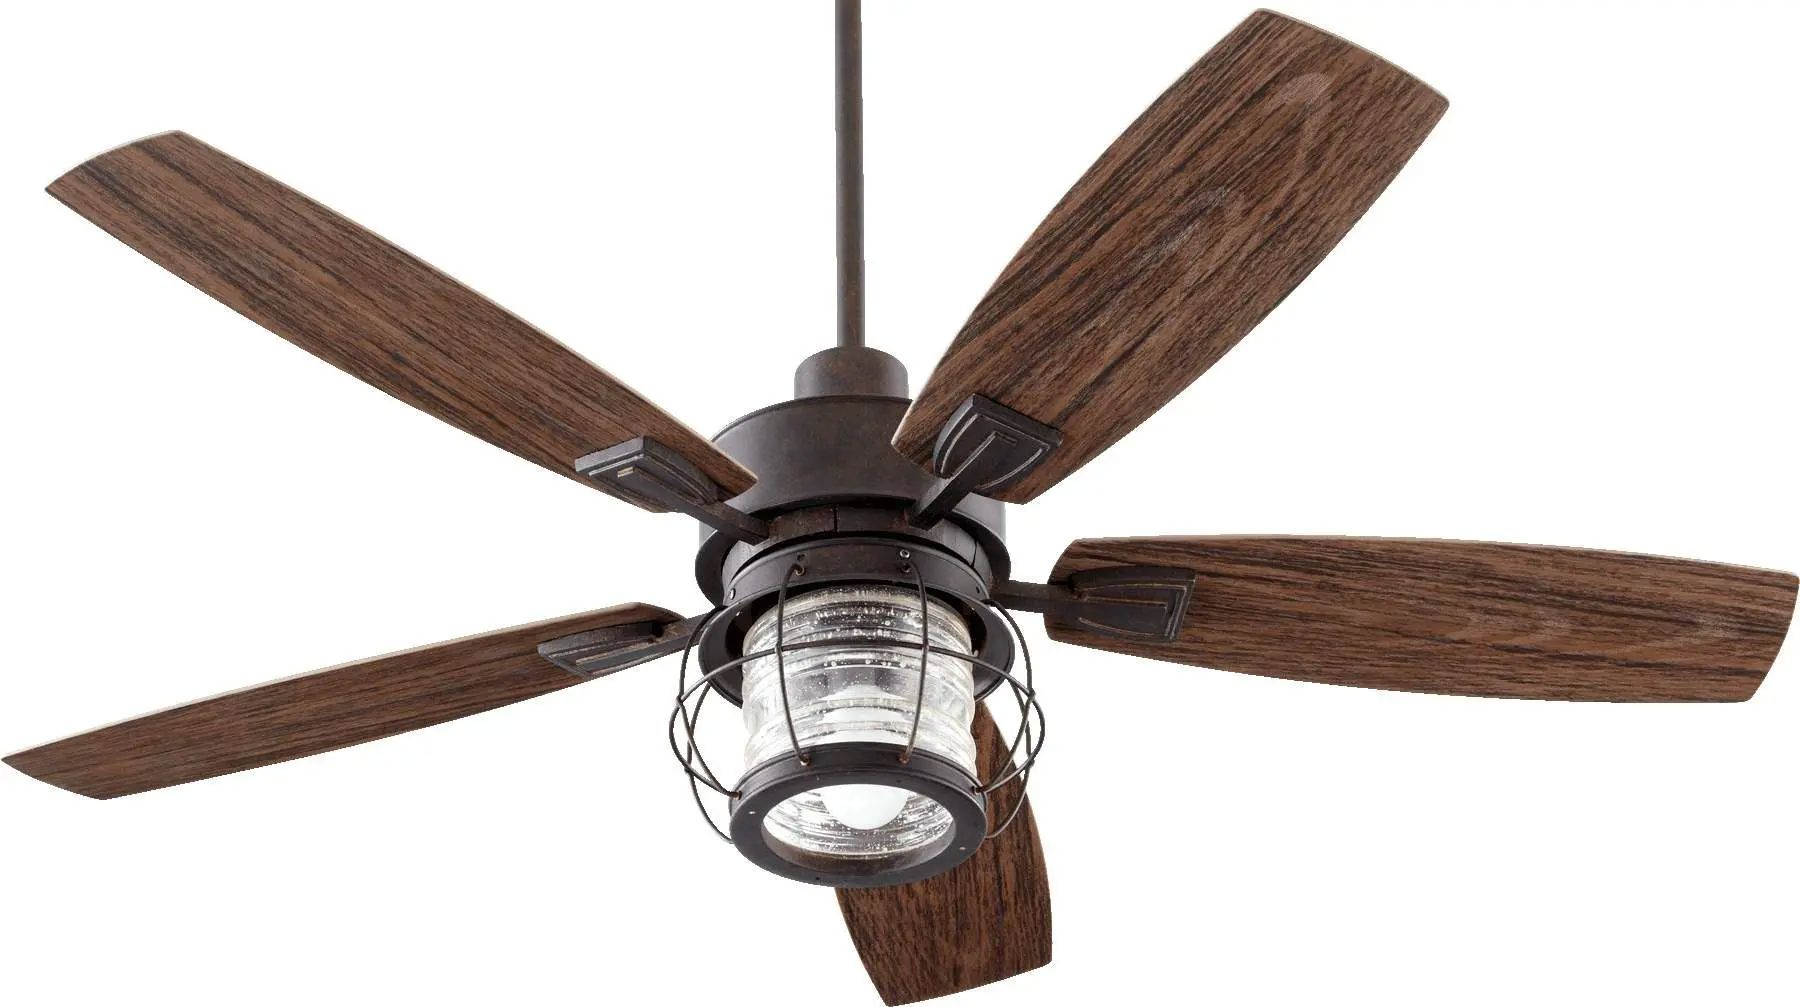 Quorum Galveston Ceiling Fan In Toasted Sienna